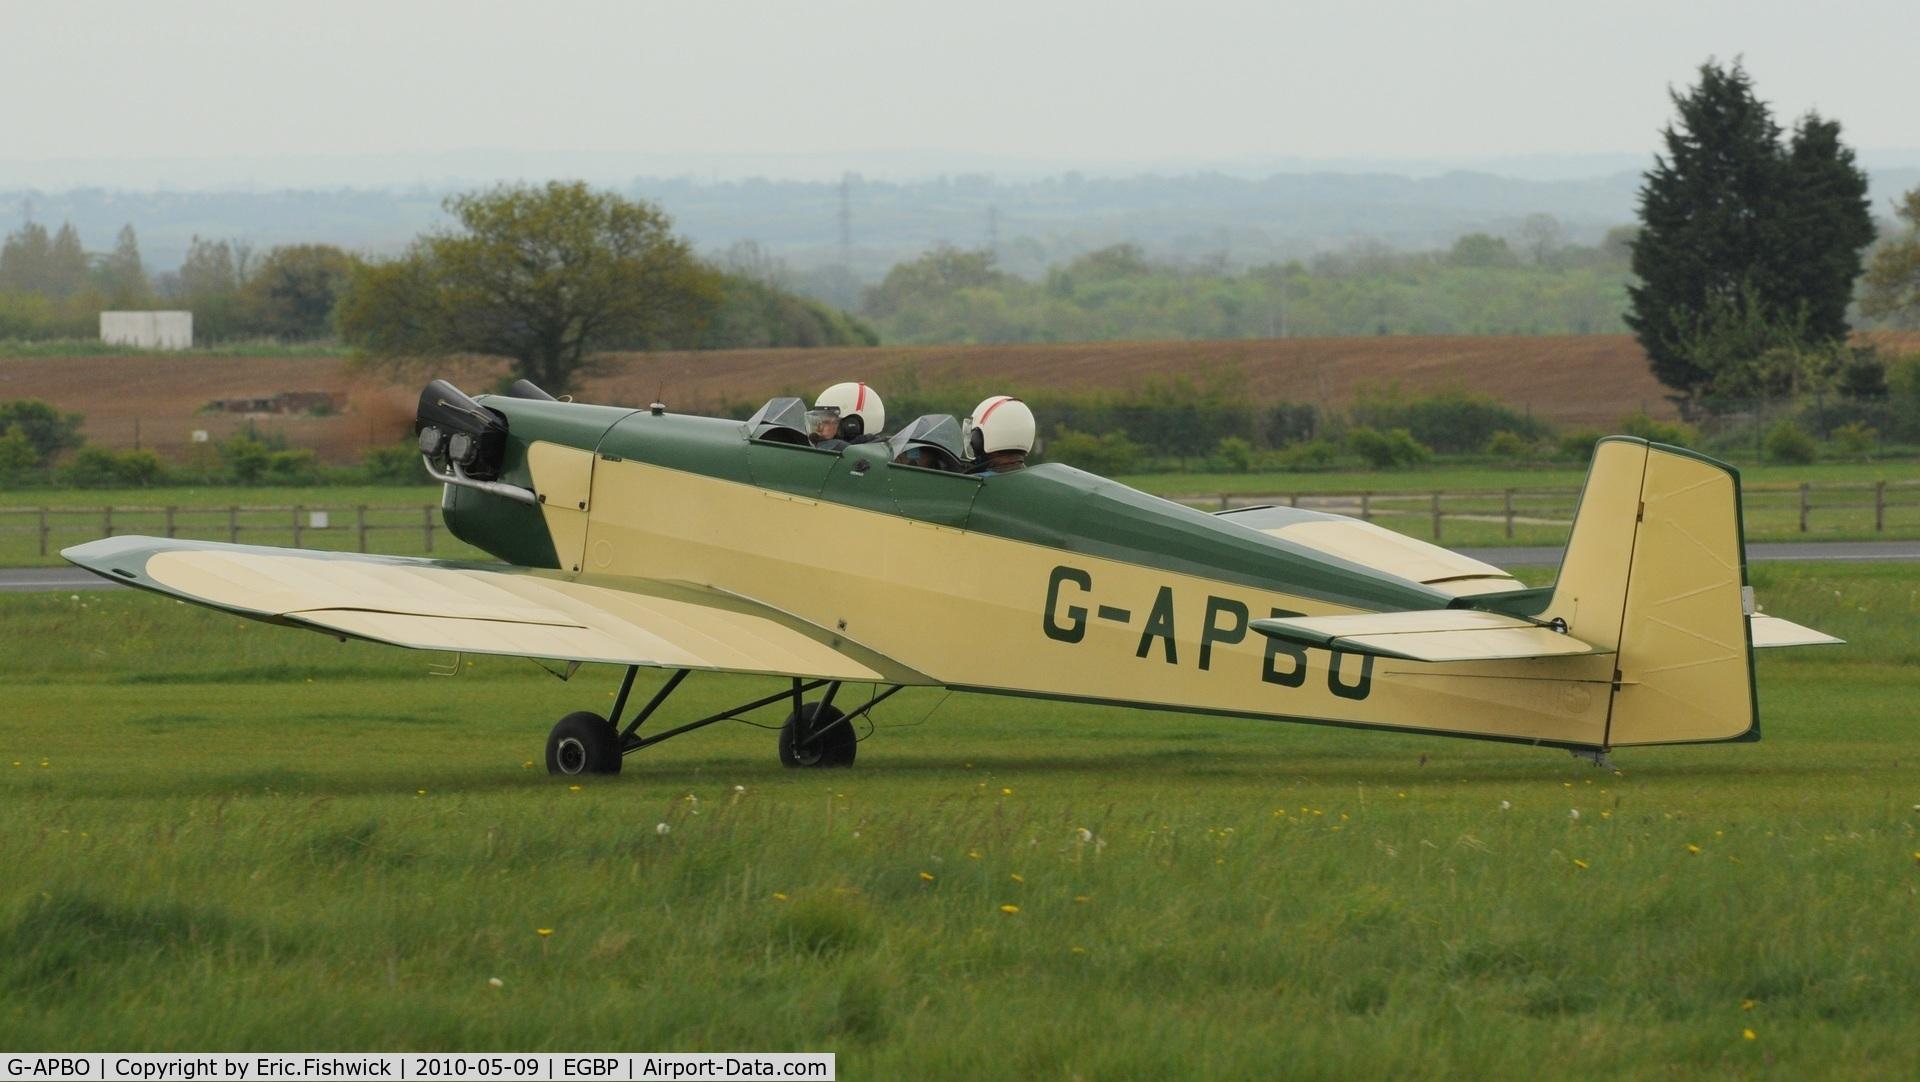 G-APBO, 1960 Druine D-5 Turbi C/N PFA 229, 1. G-APBO Unique Turbi at Kemble Airport (Great Vintage Flying Weekend)